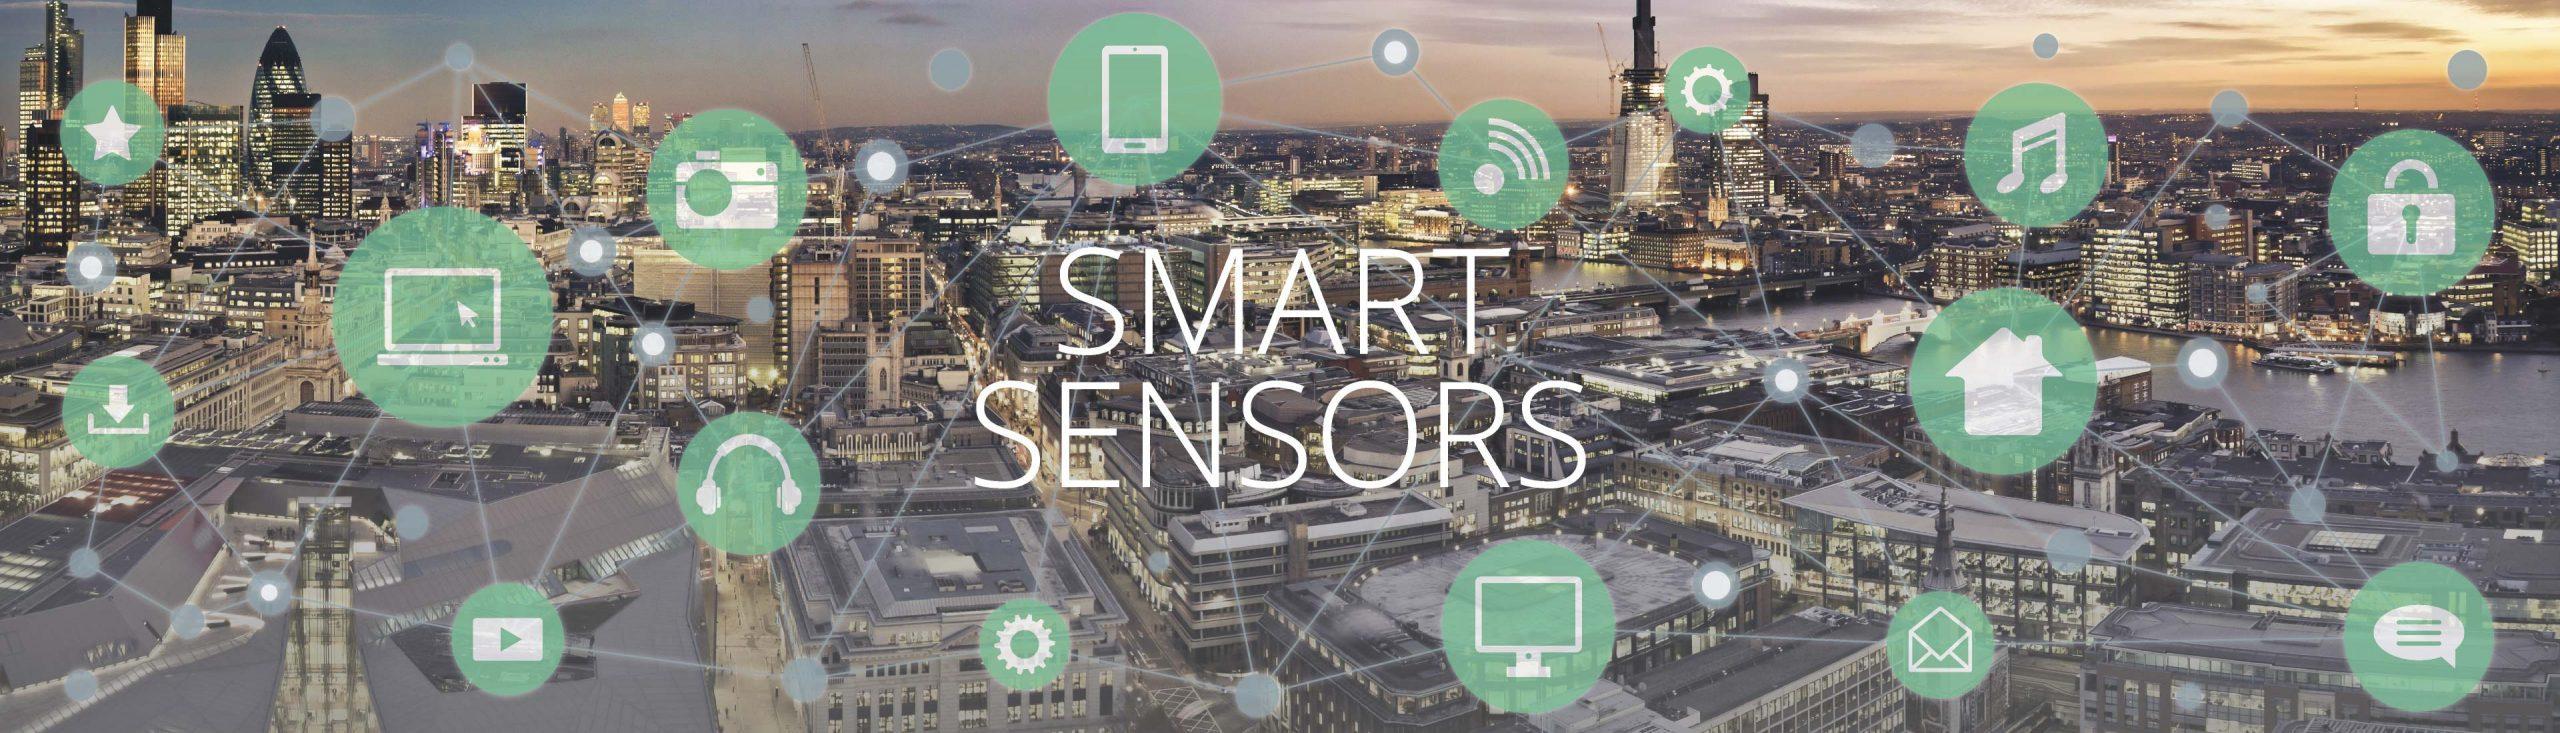 Plextek launches Smart Sensors fourth market